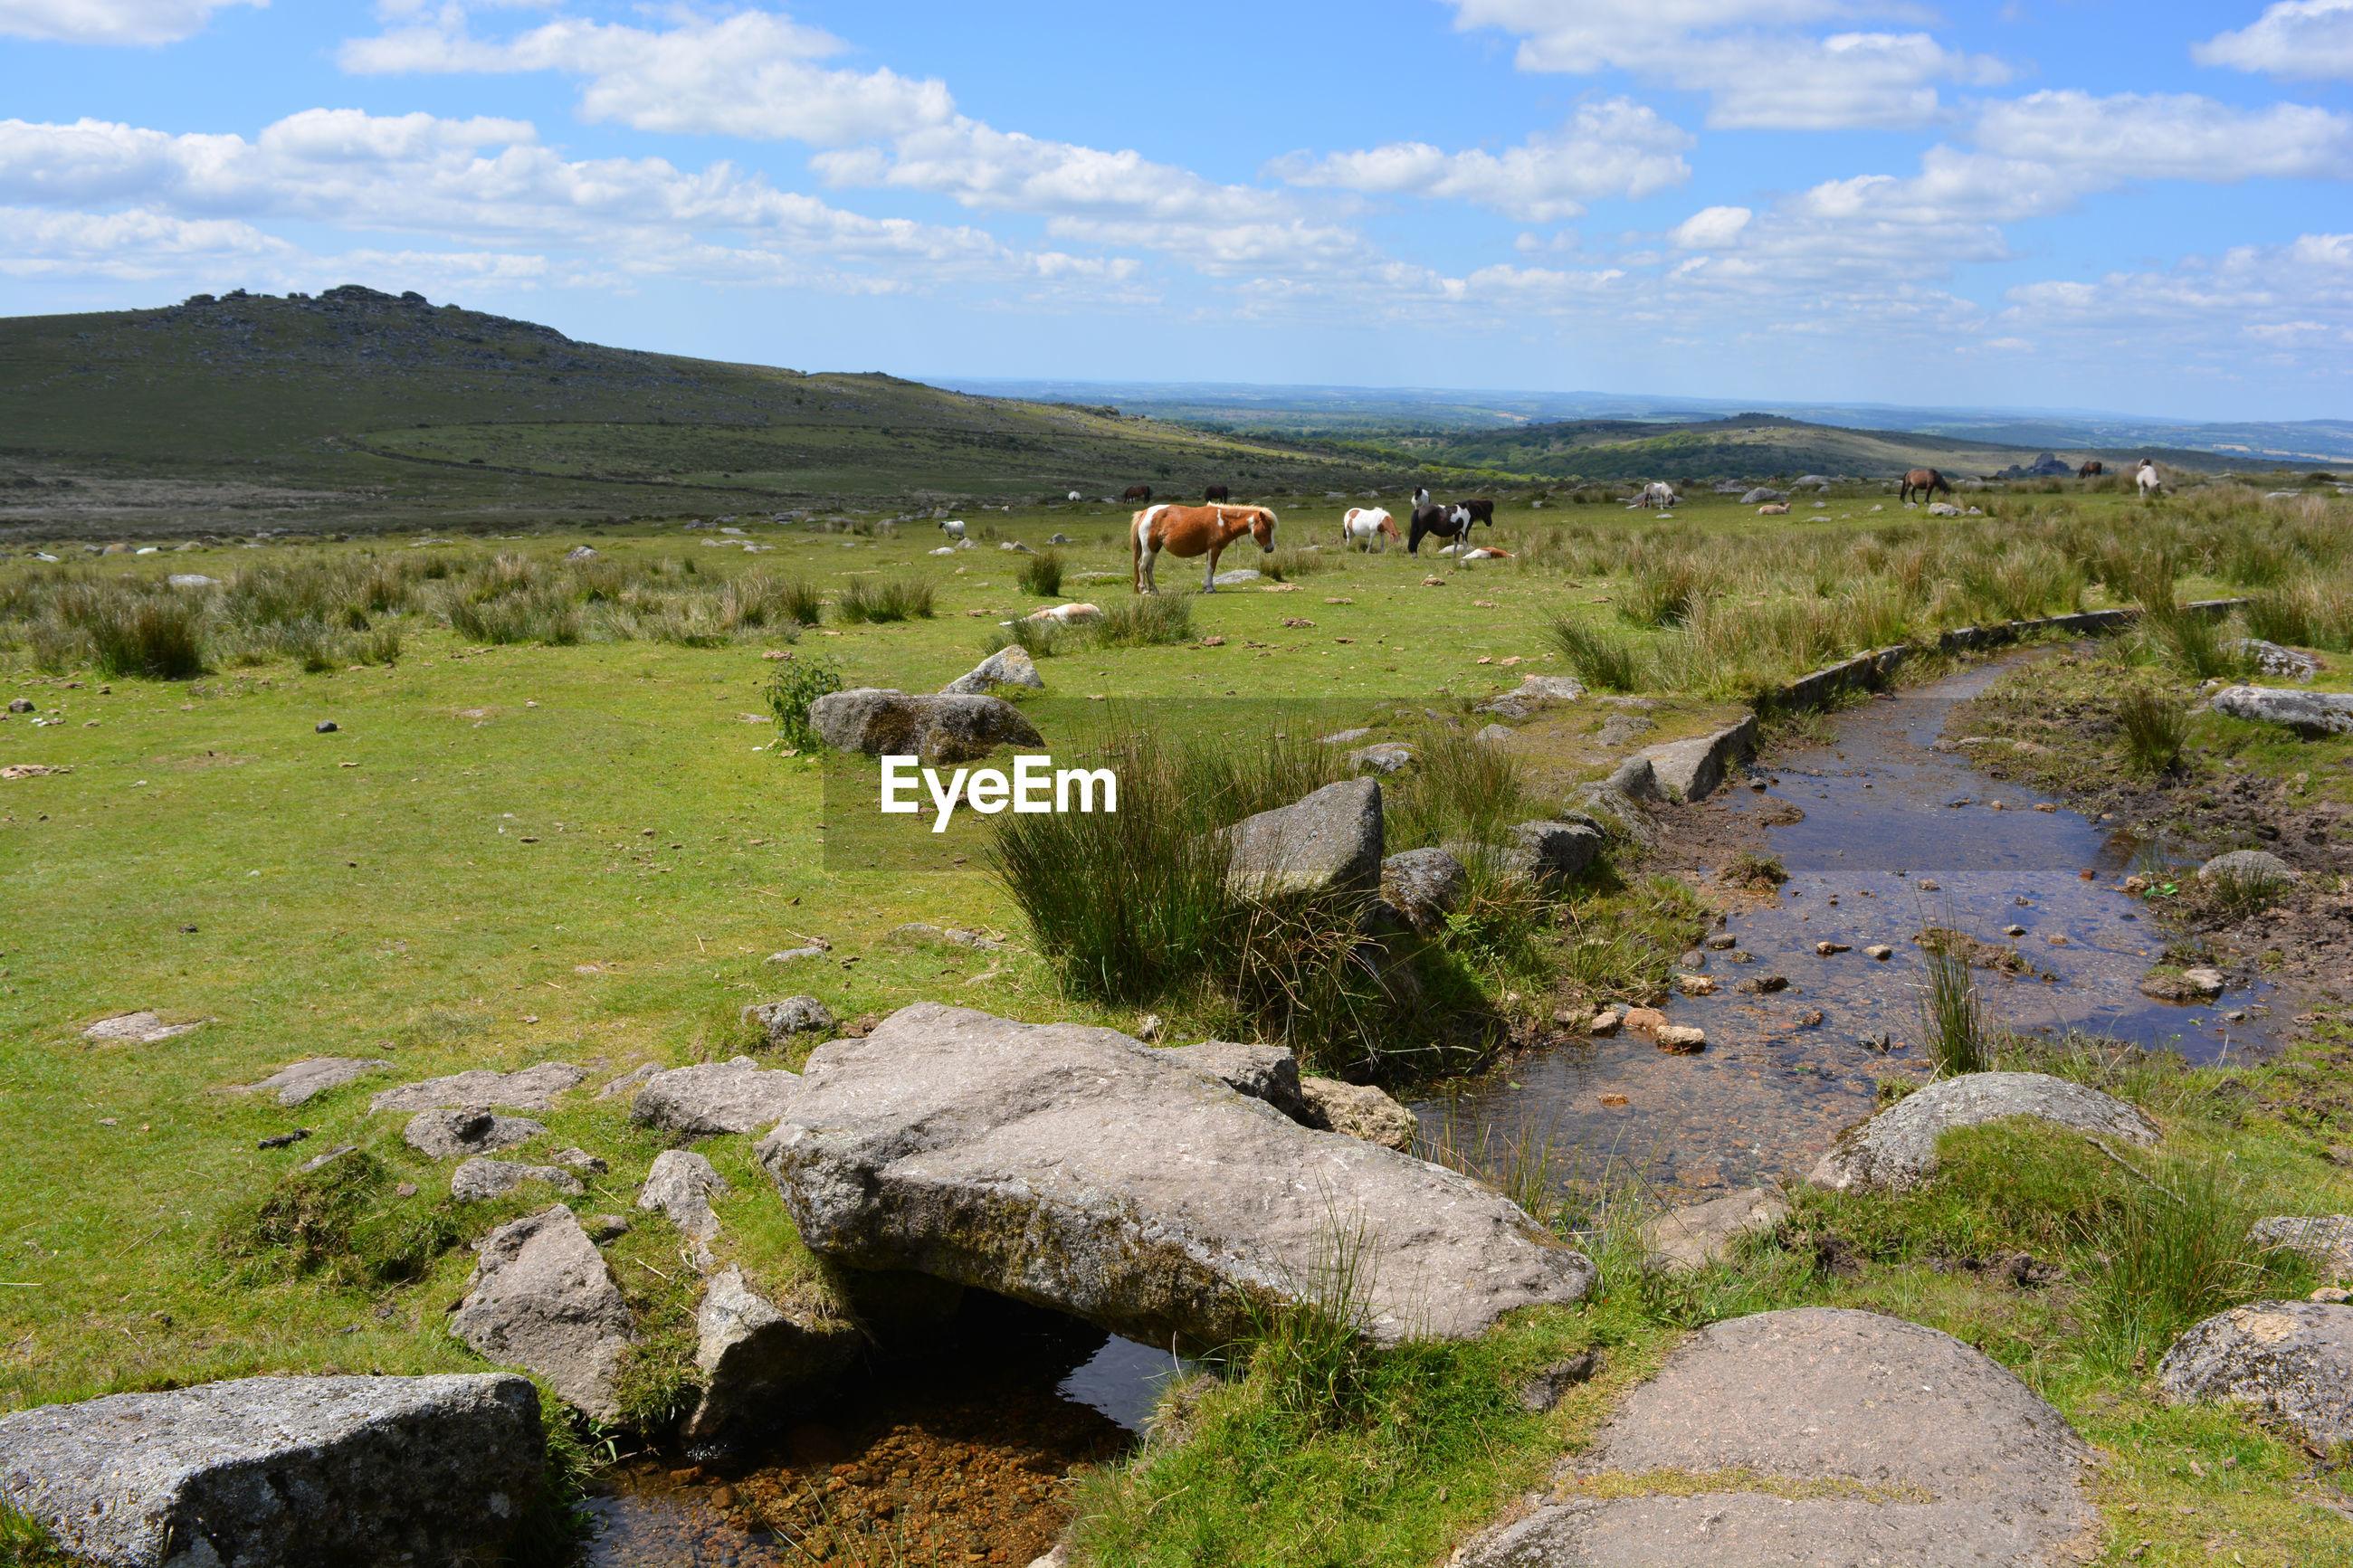 Dartmoor ponies, clapper bridge and longash leat, merrivale, dartmoor national park, devon, england